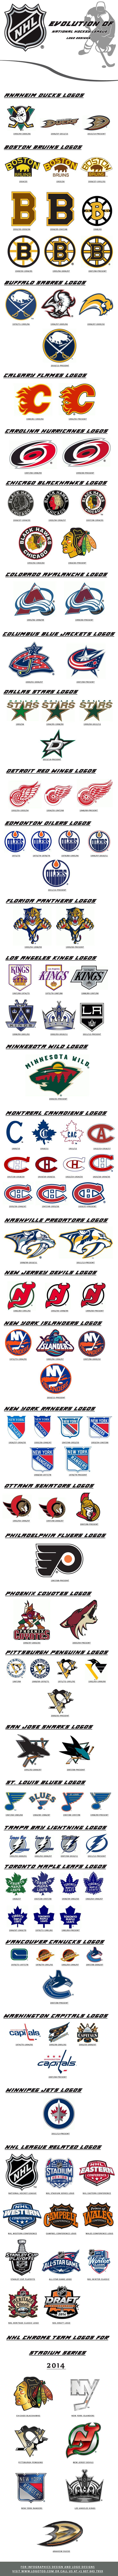 best 25 nhl logos ideas only on pinterest nhl hockey teams